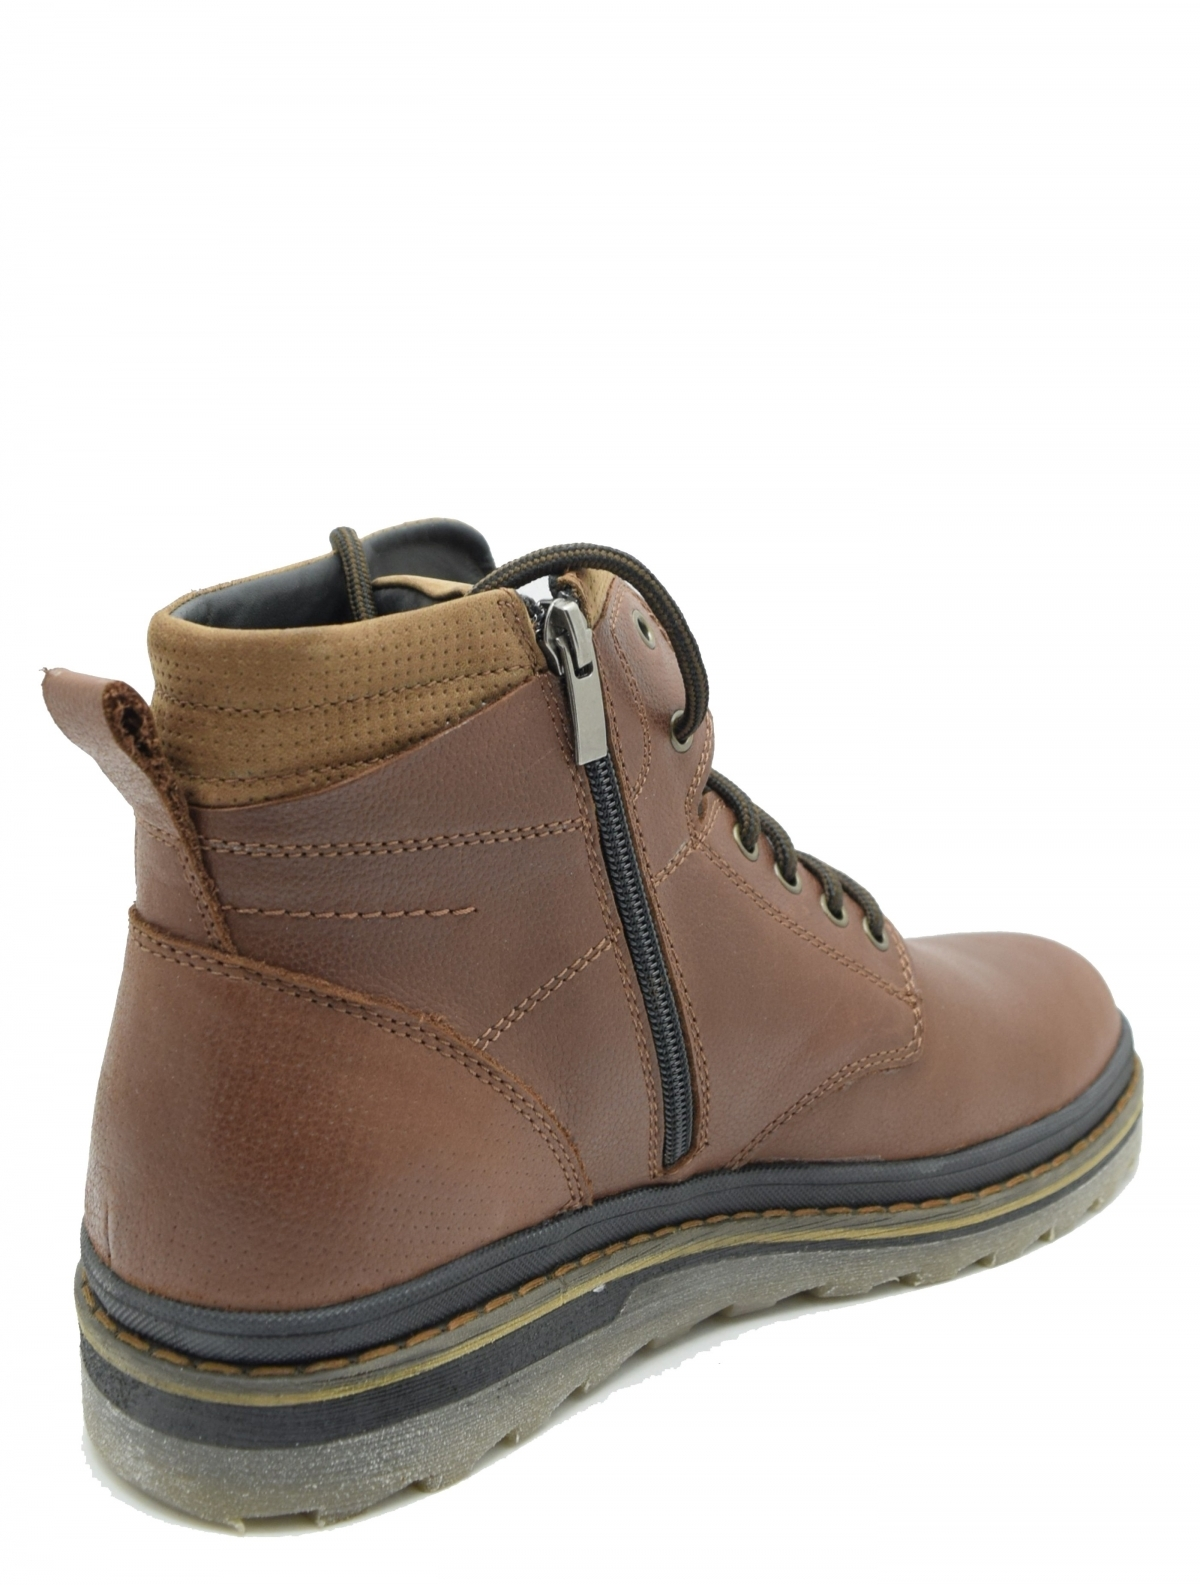 Baratto 1-801-306-2 мужские ботинки